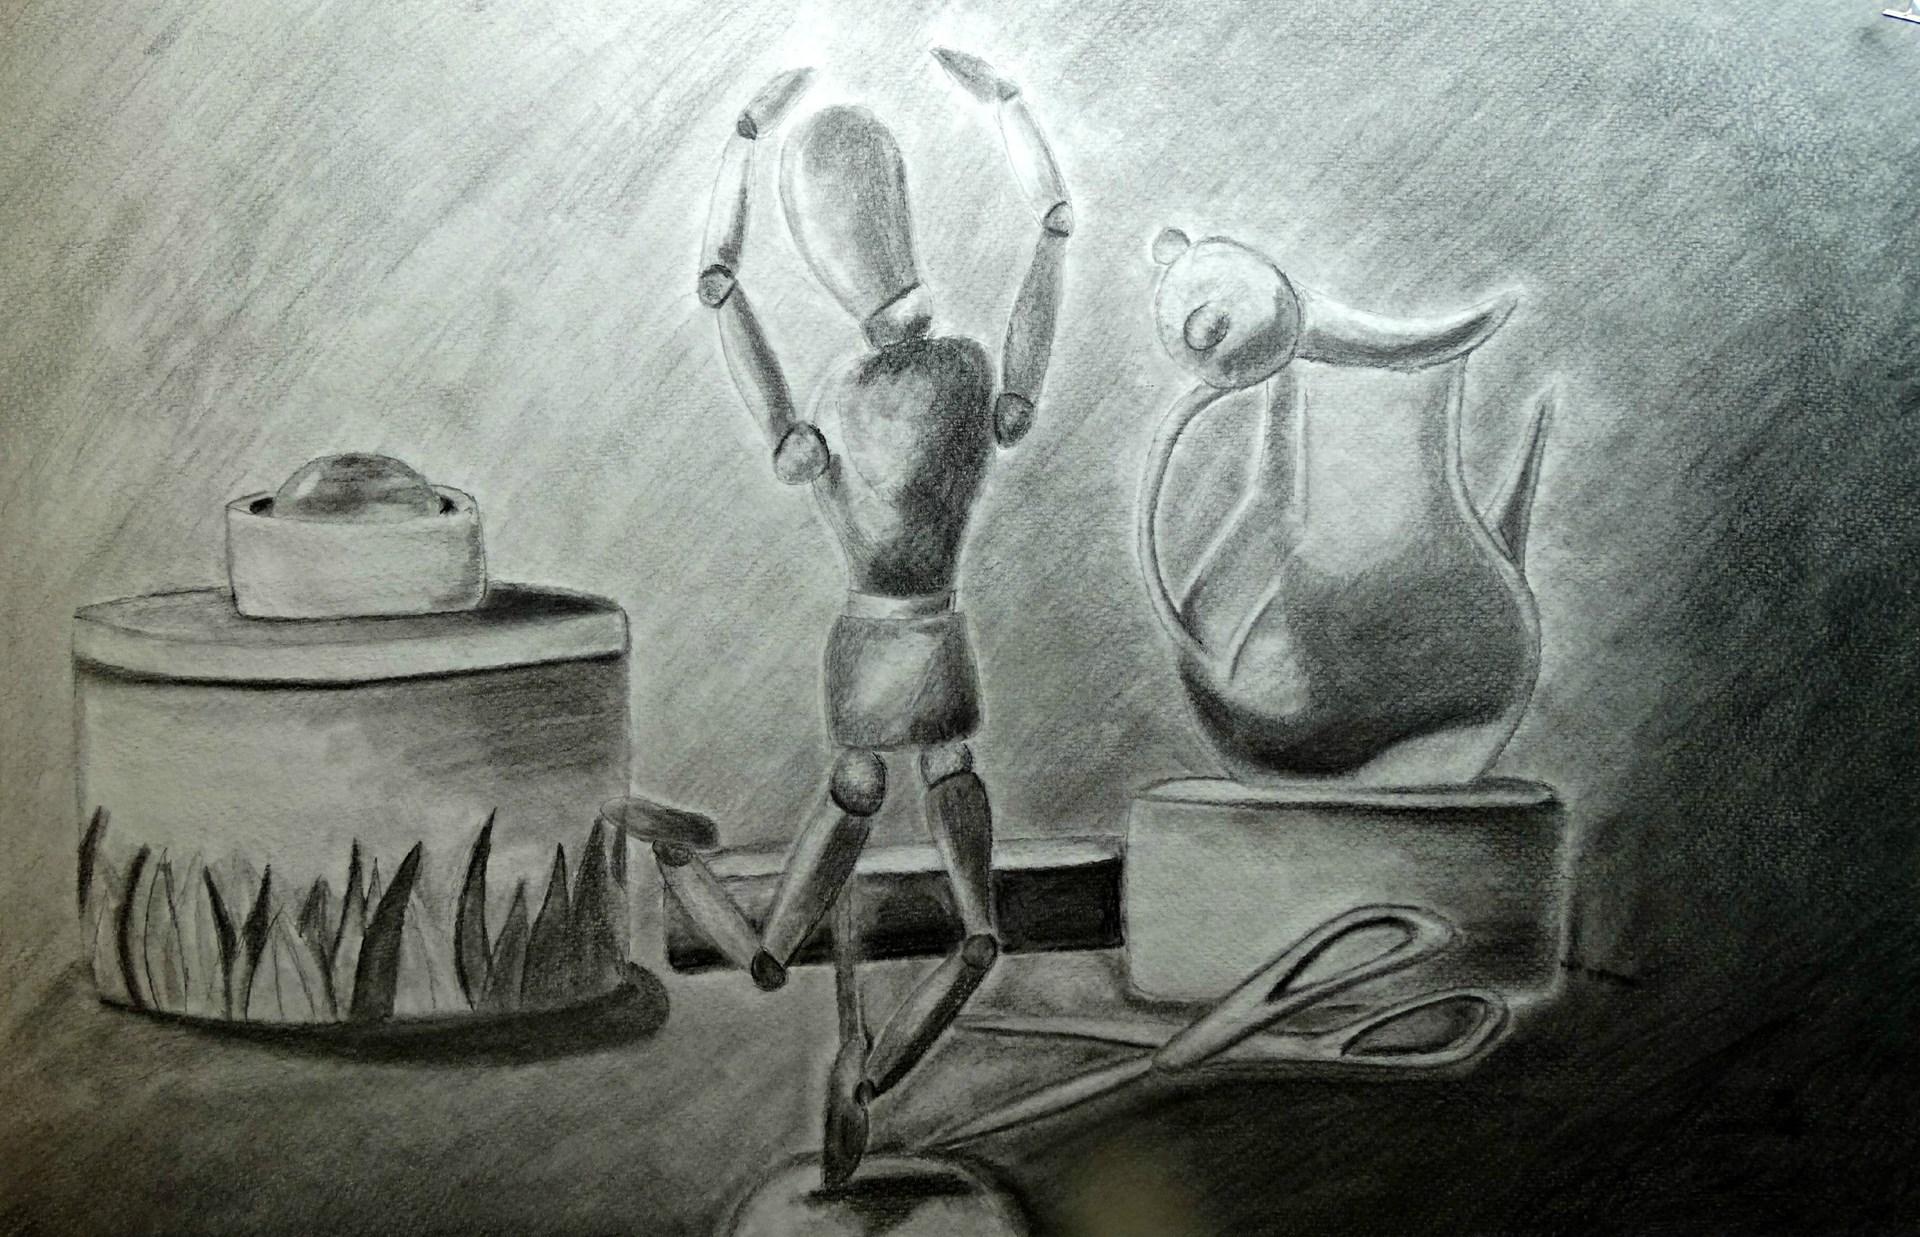 Artist: Samantha Bedillion, Grade 10 at McGuffey HS